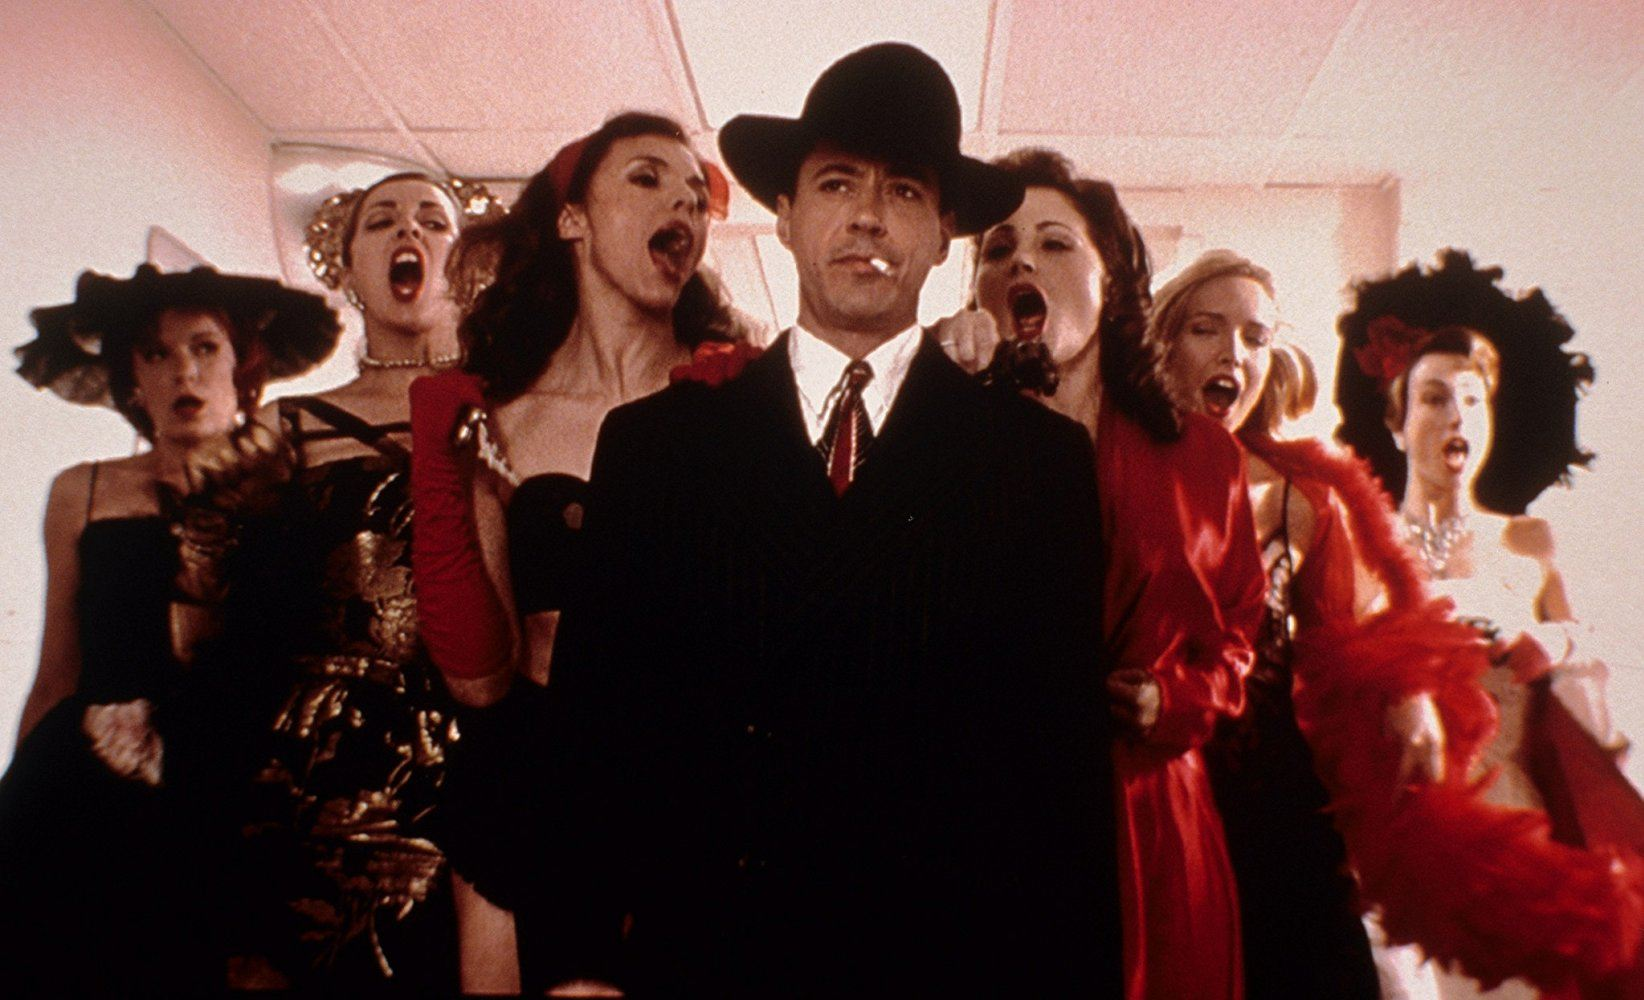 Robert Downey Jr in The Singing Detective